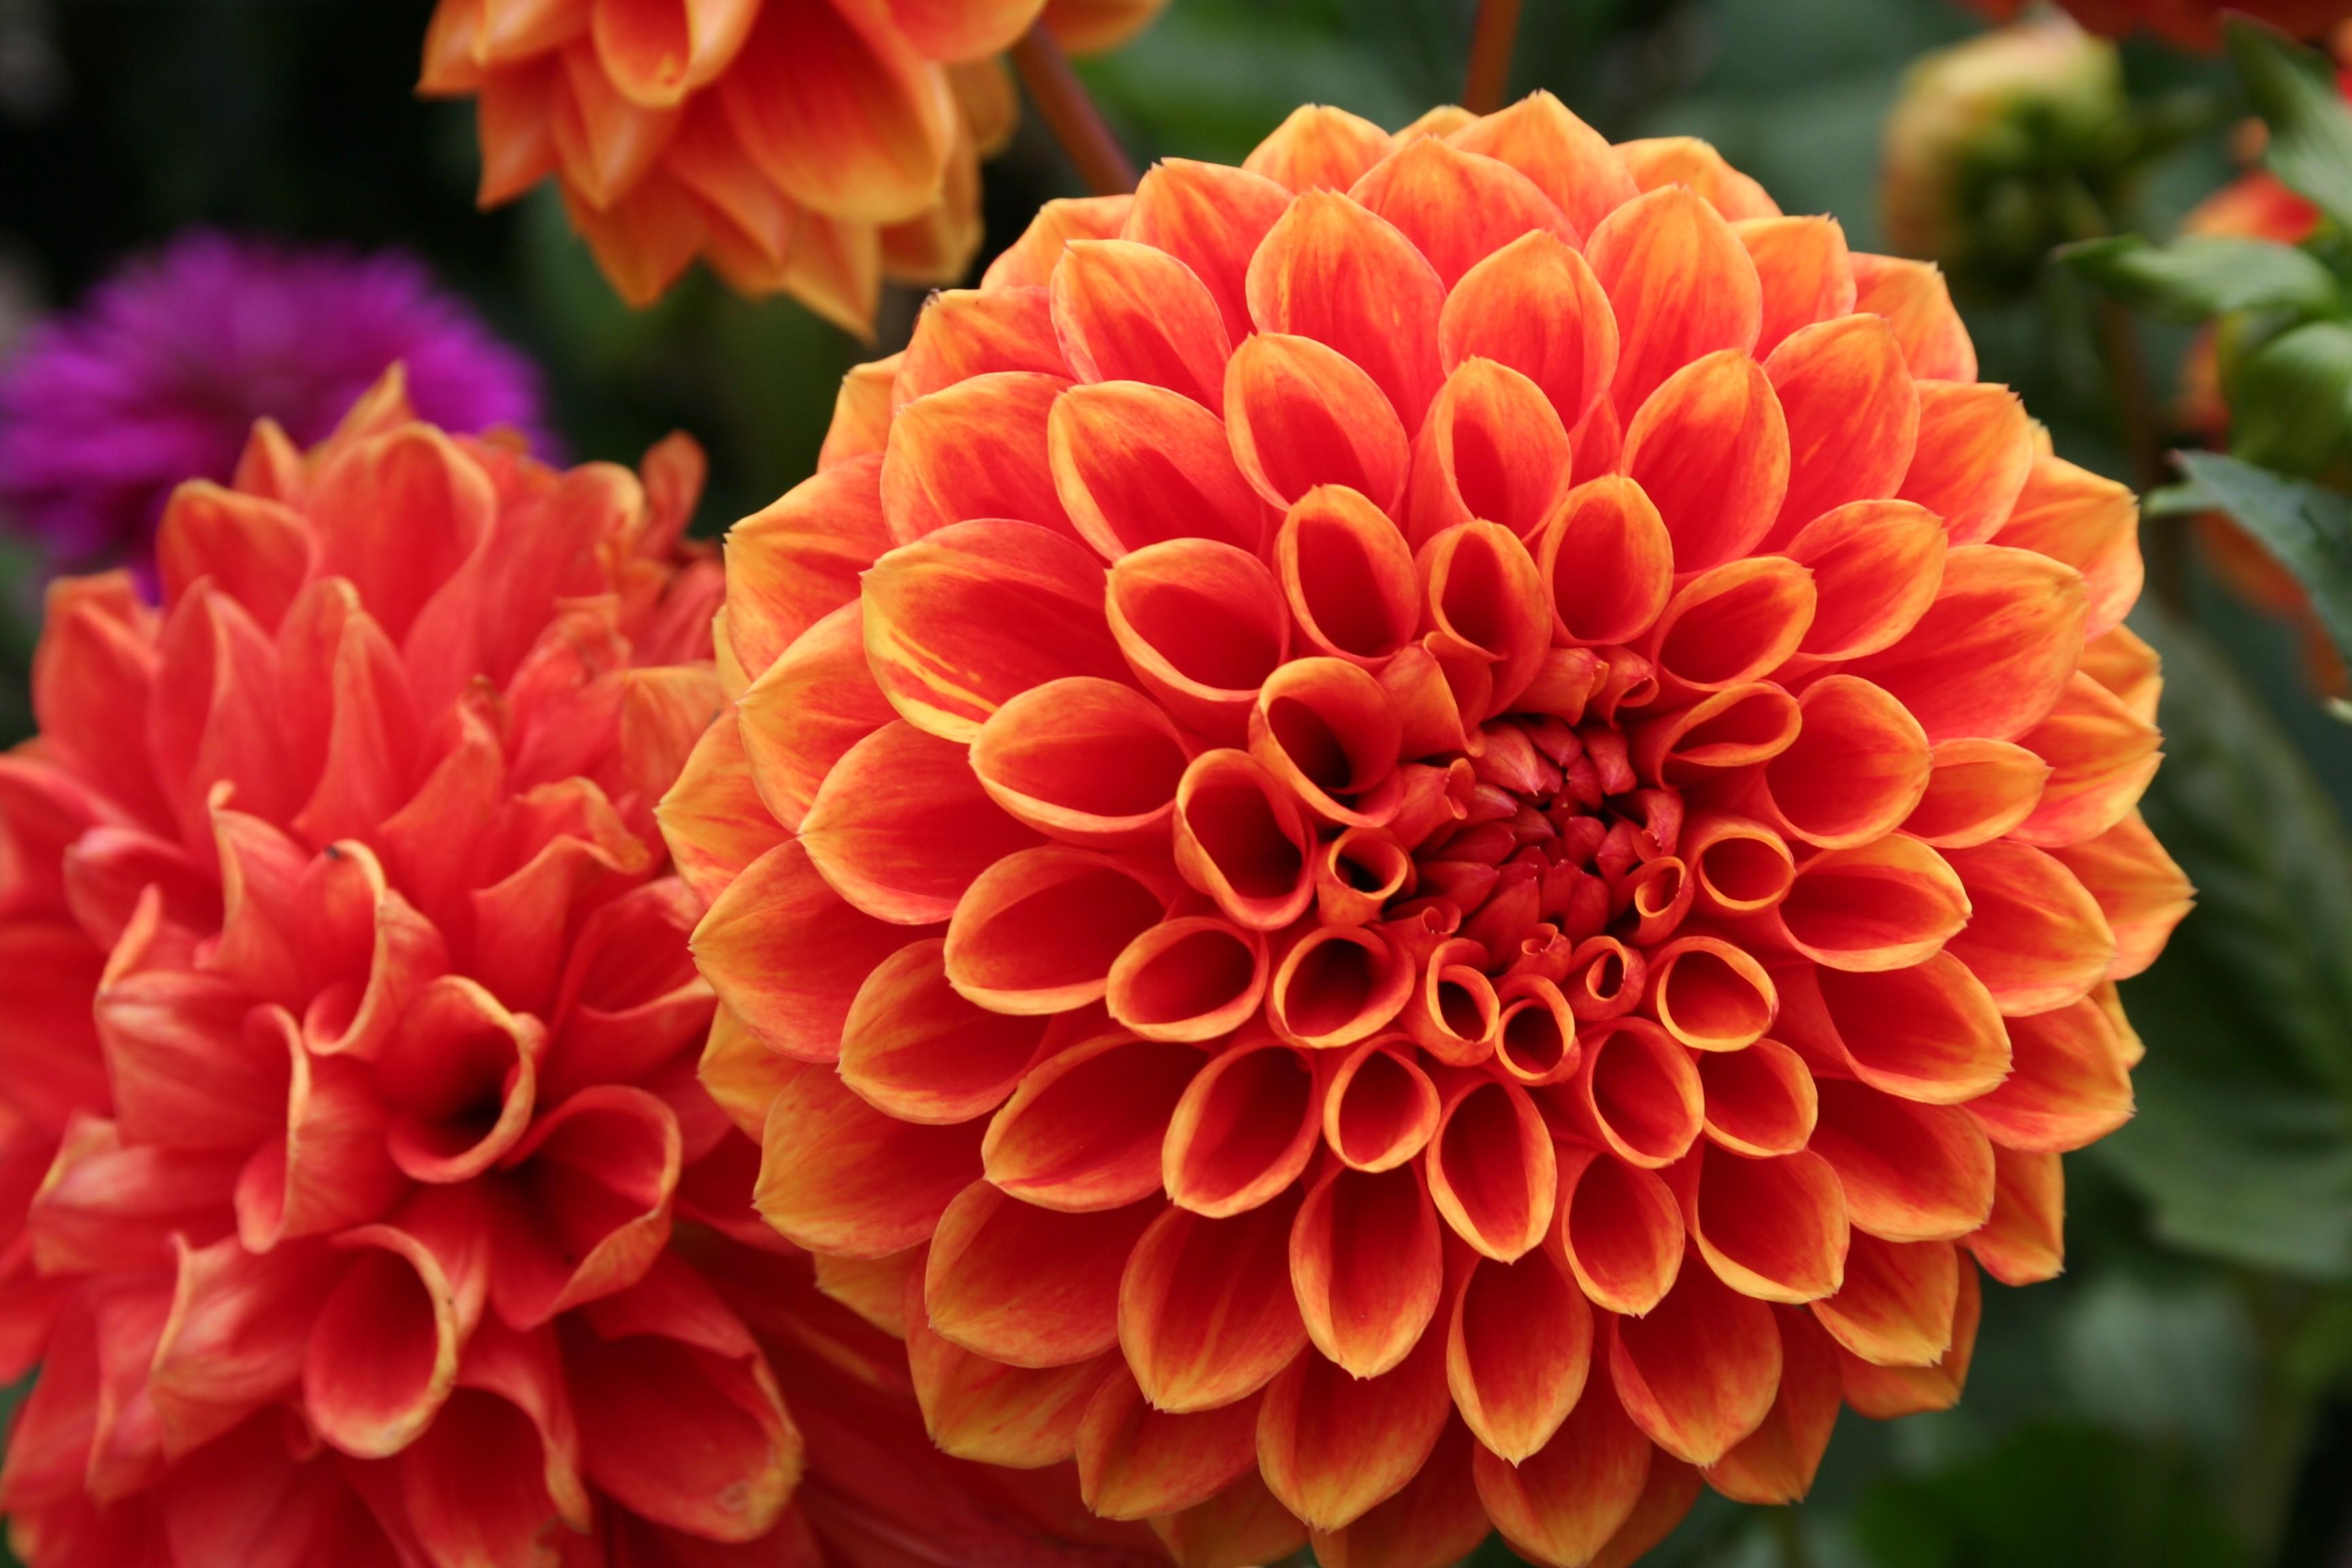 Free photo: Orange flowers - Yellow, Pink, Nature - Free ...